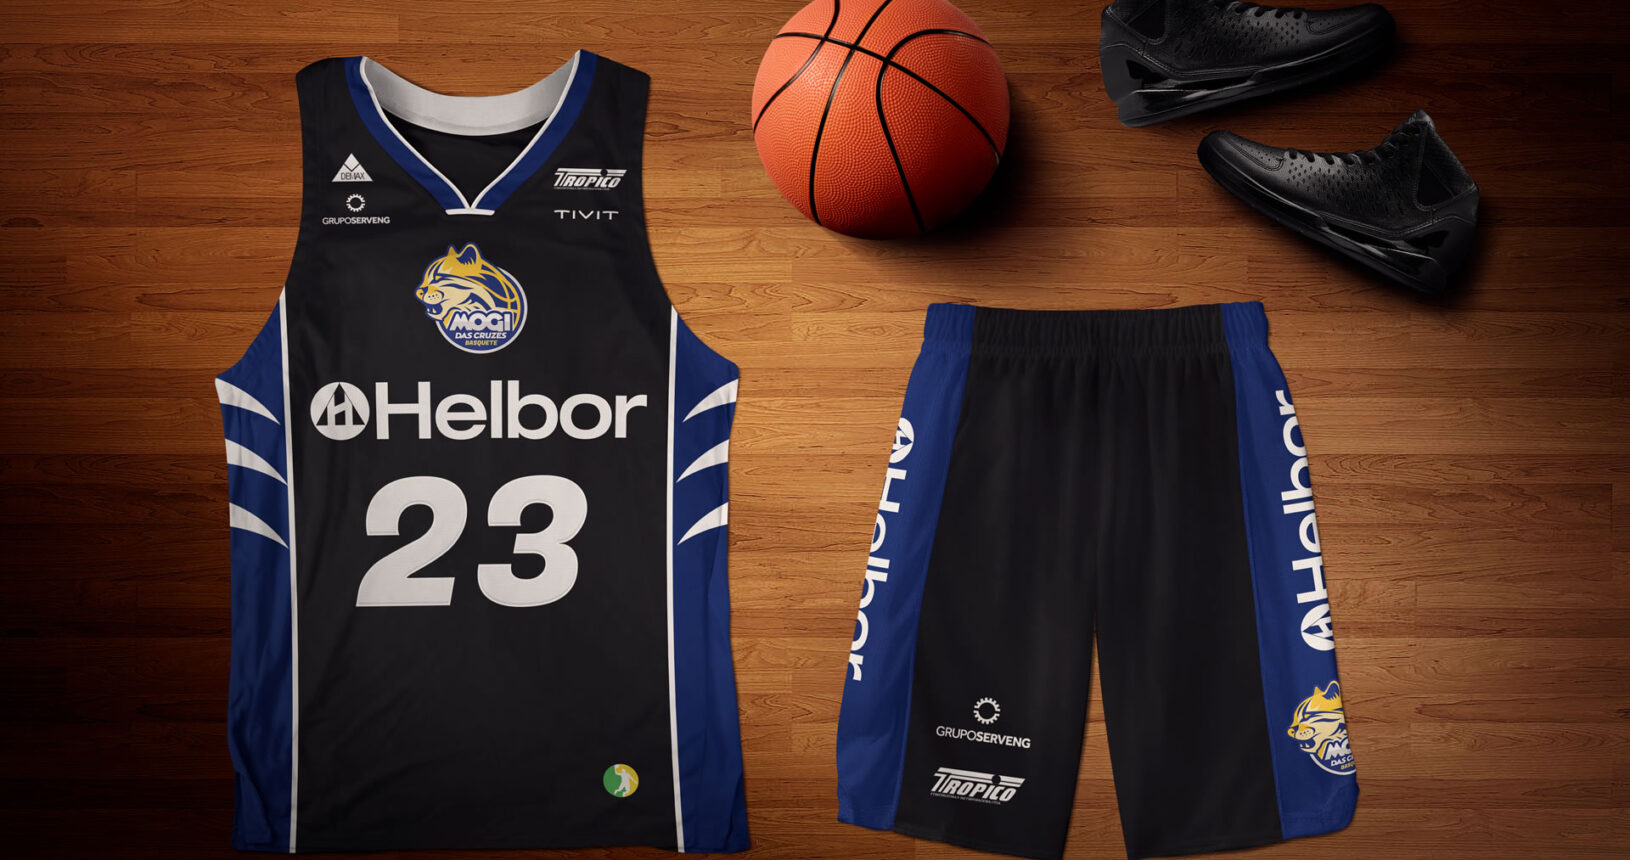 mogi cruzes basquete uniforme preto